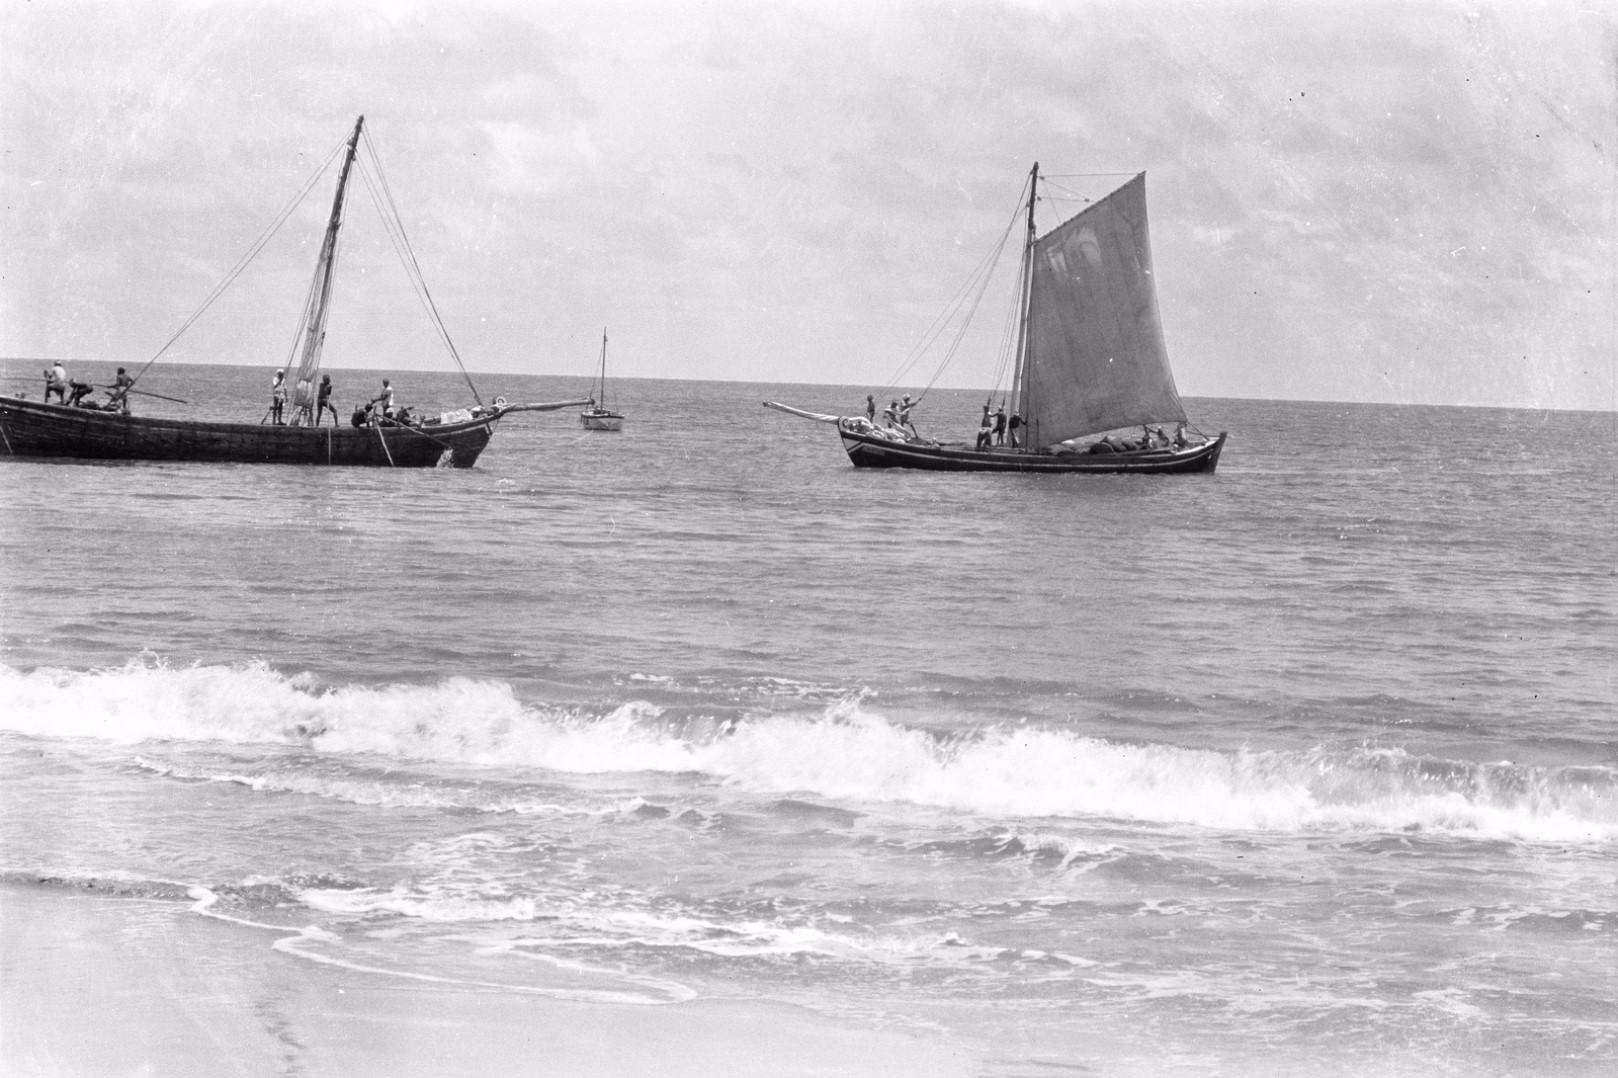 319. Баттикалоа. Лодки в прибрежных водах